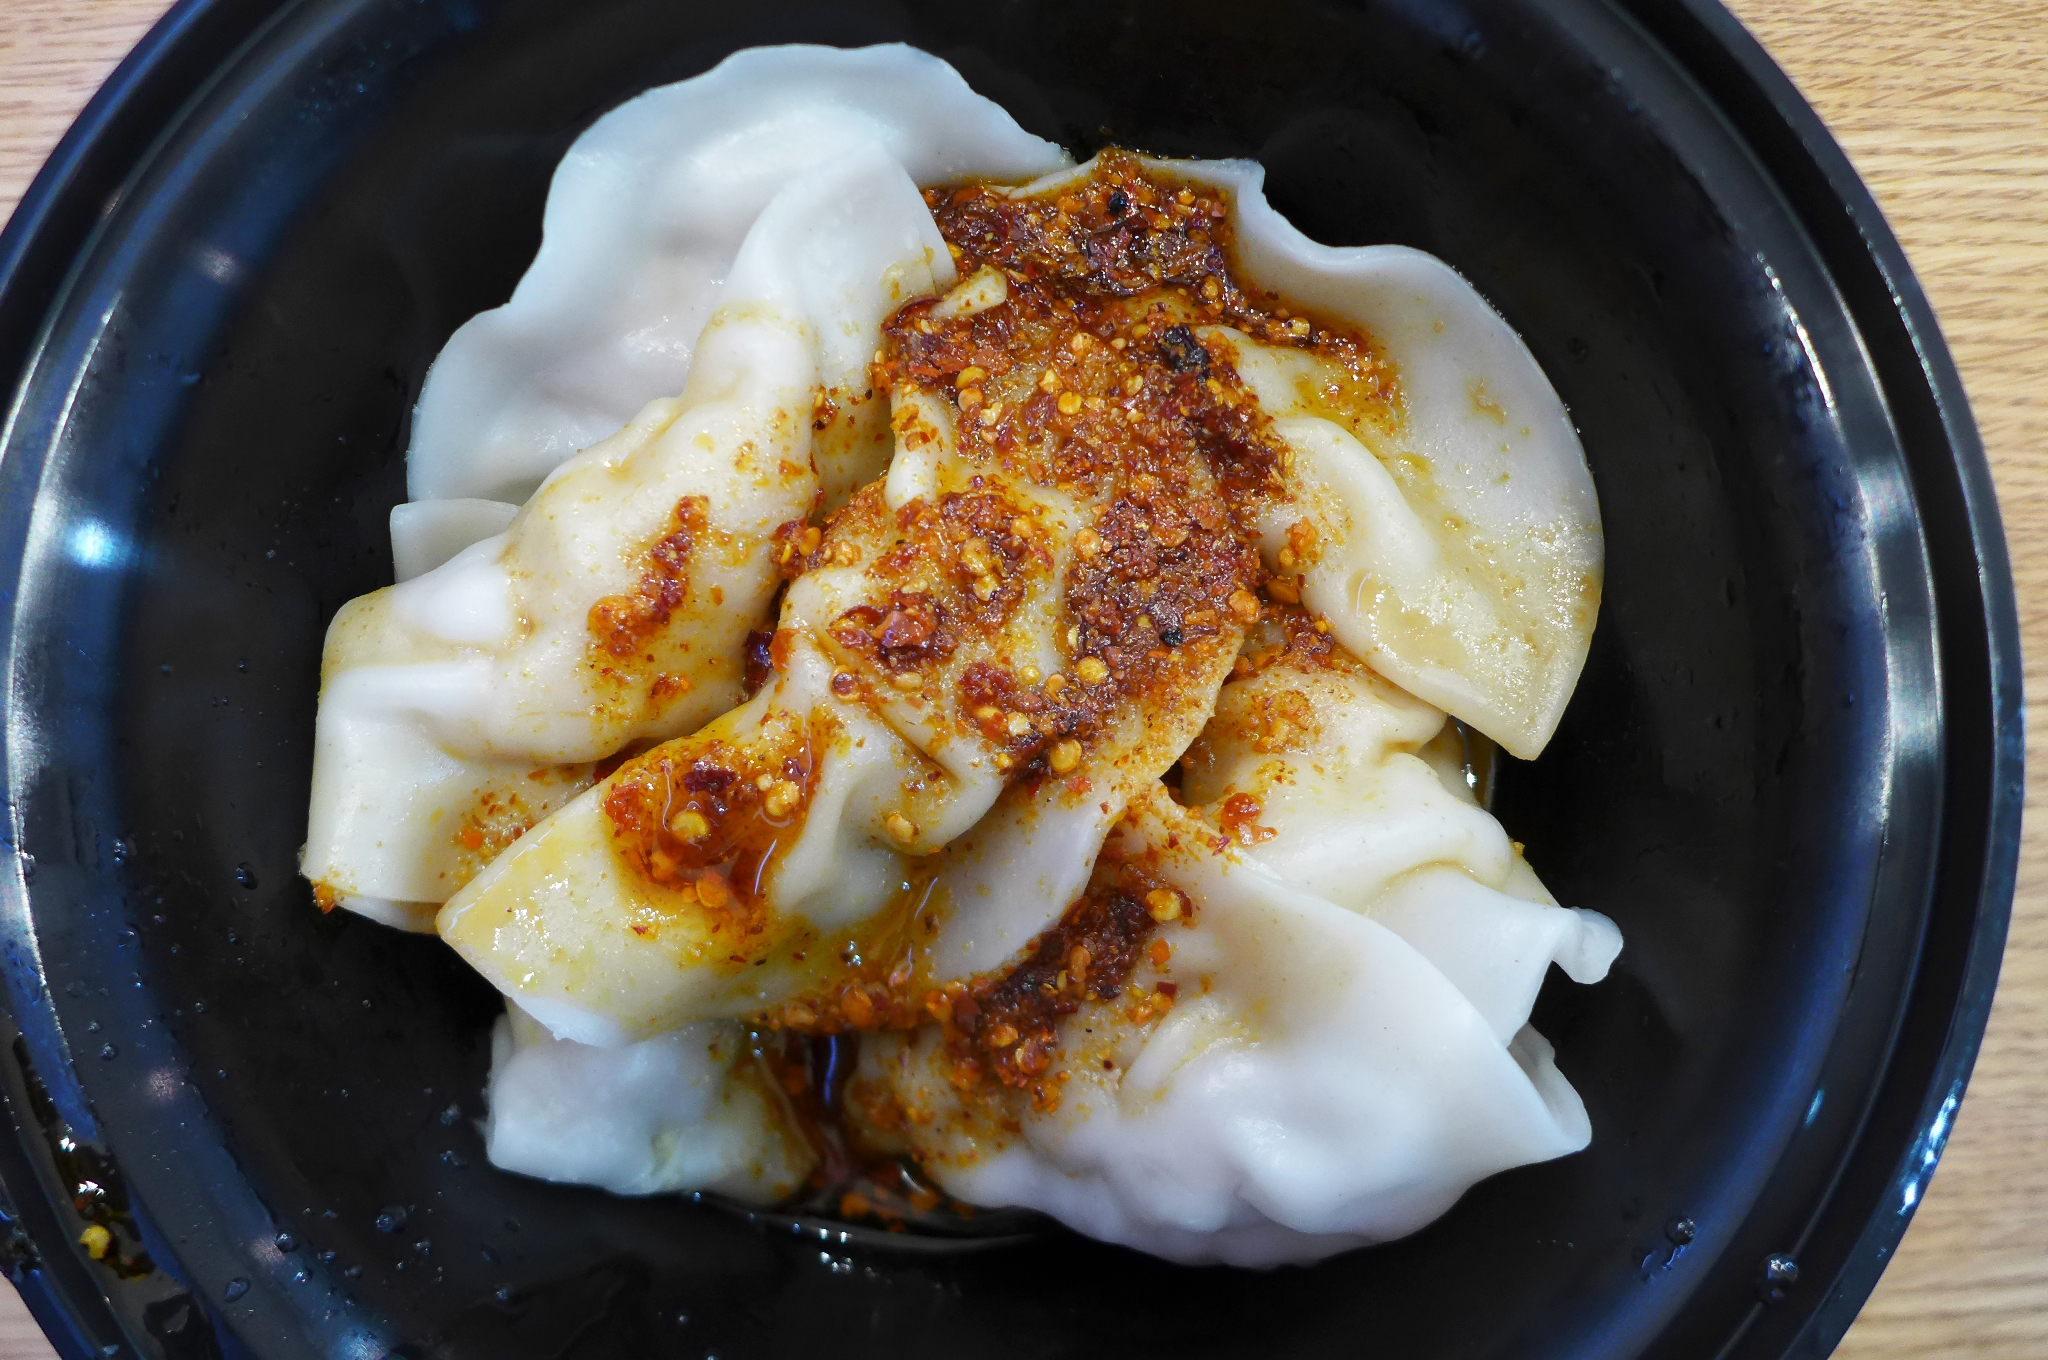 Chile oil dumplings